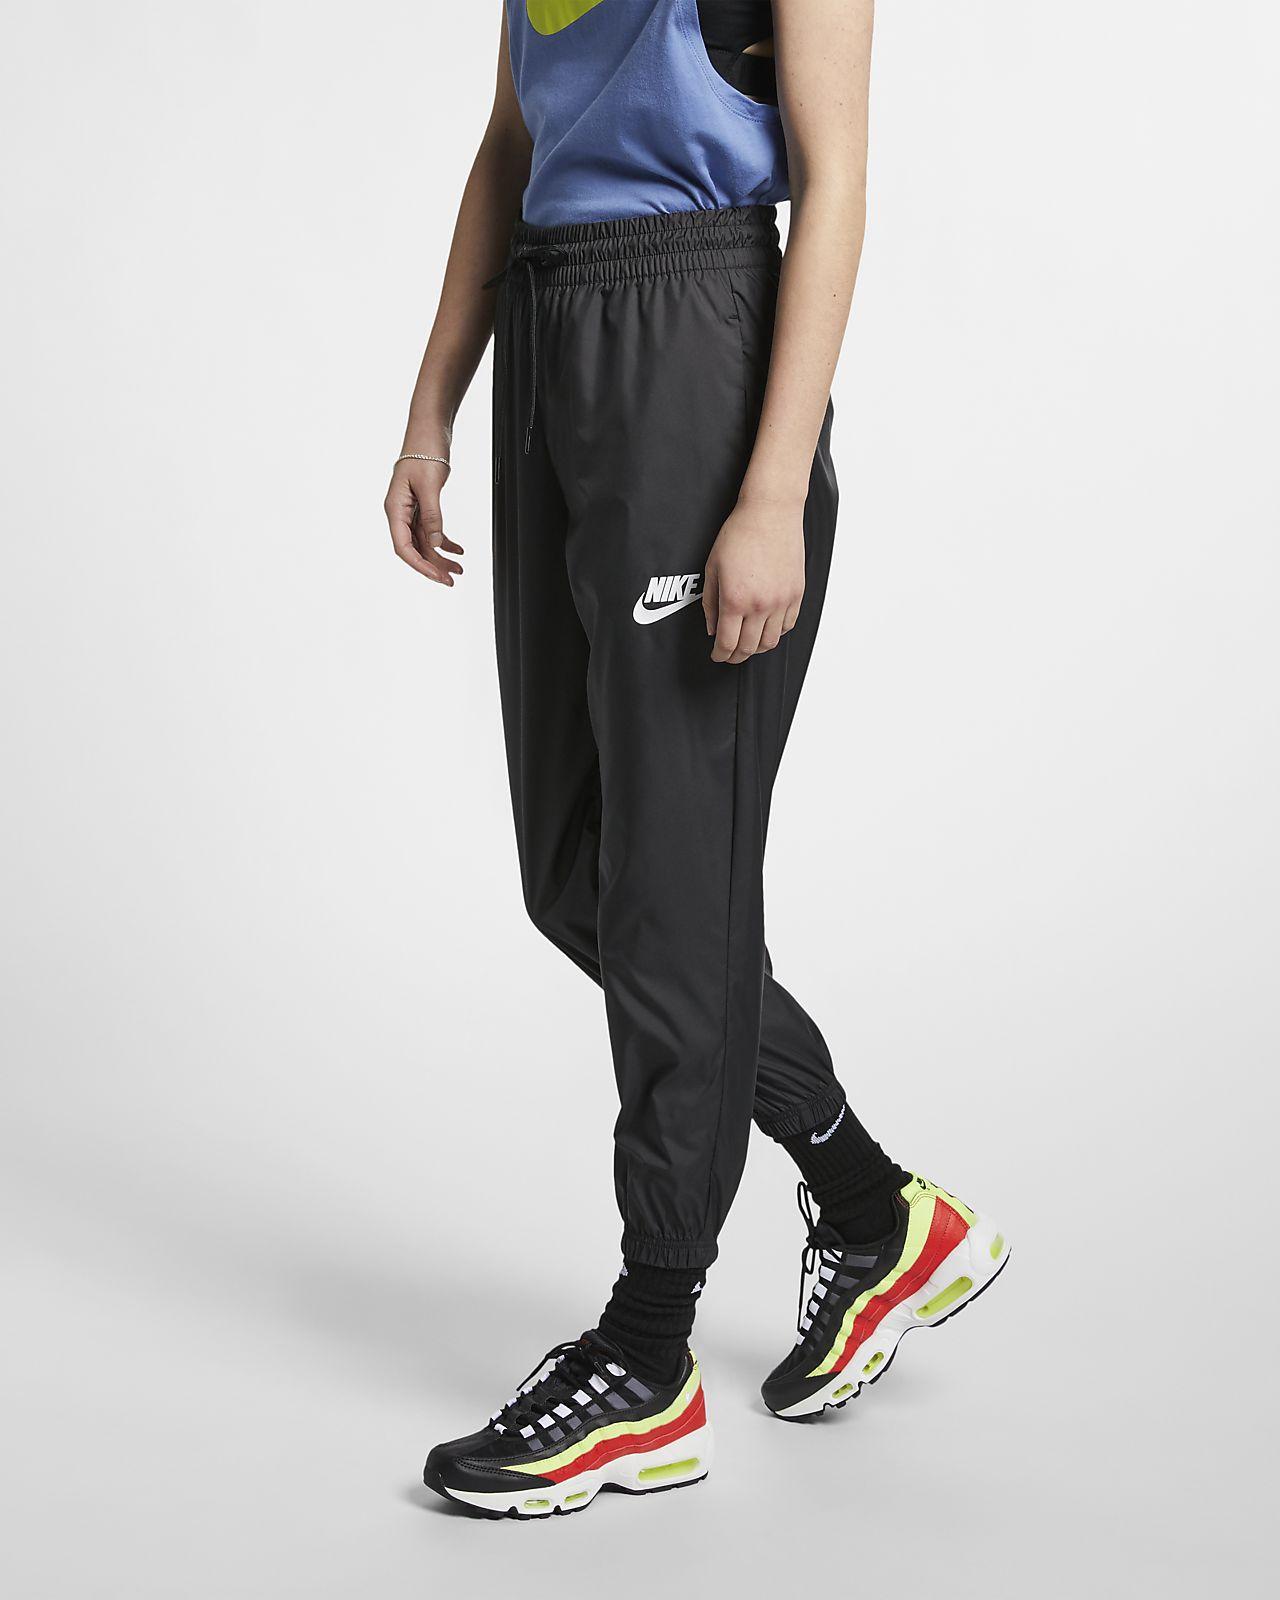 Pantaloni woven Nike Sportswear Donna